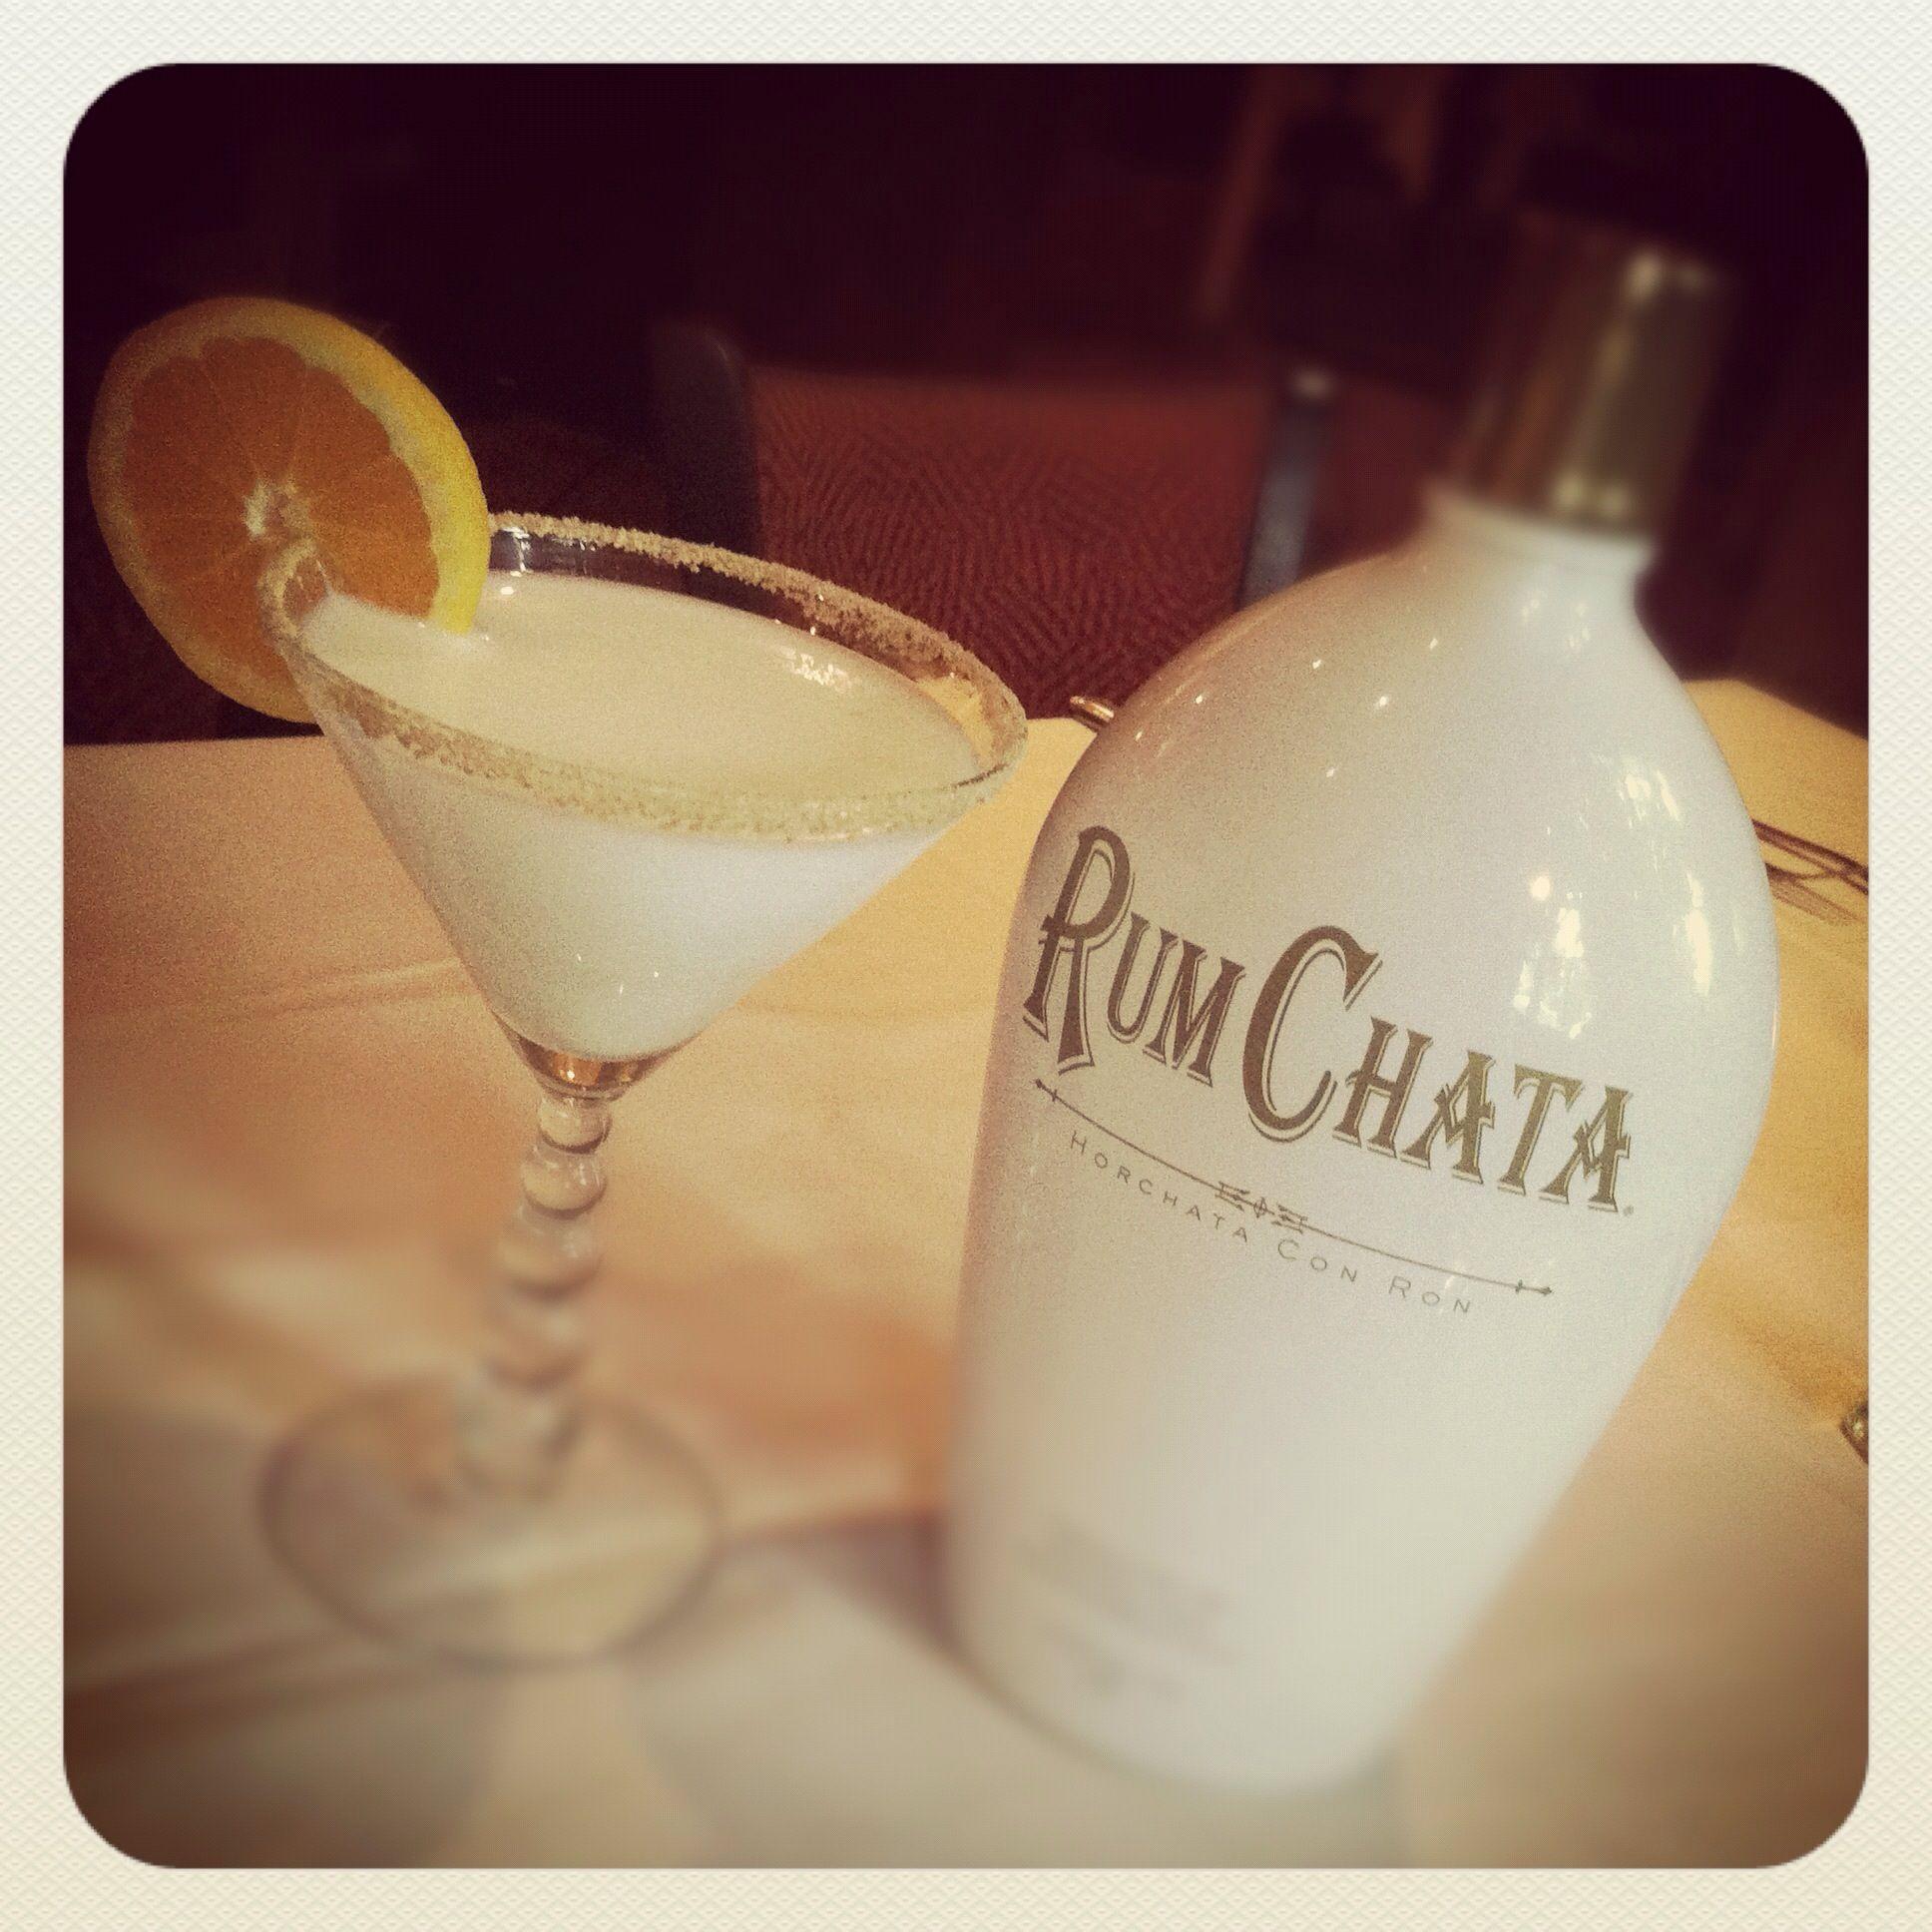 Rum Chata, Vanilla Vodka And Frangelico.